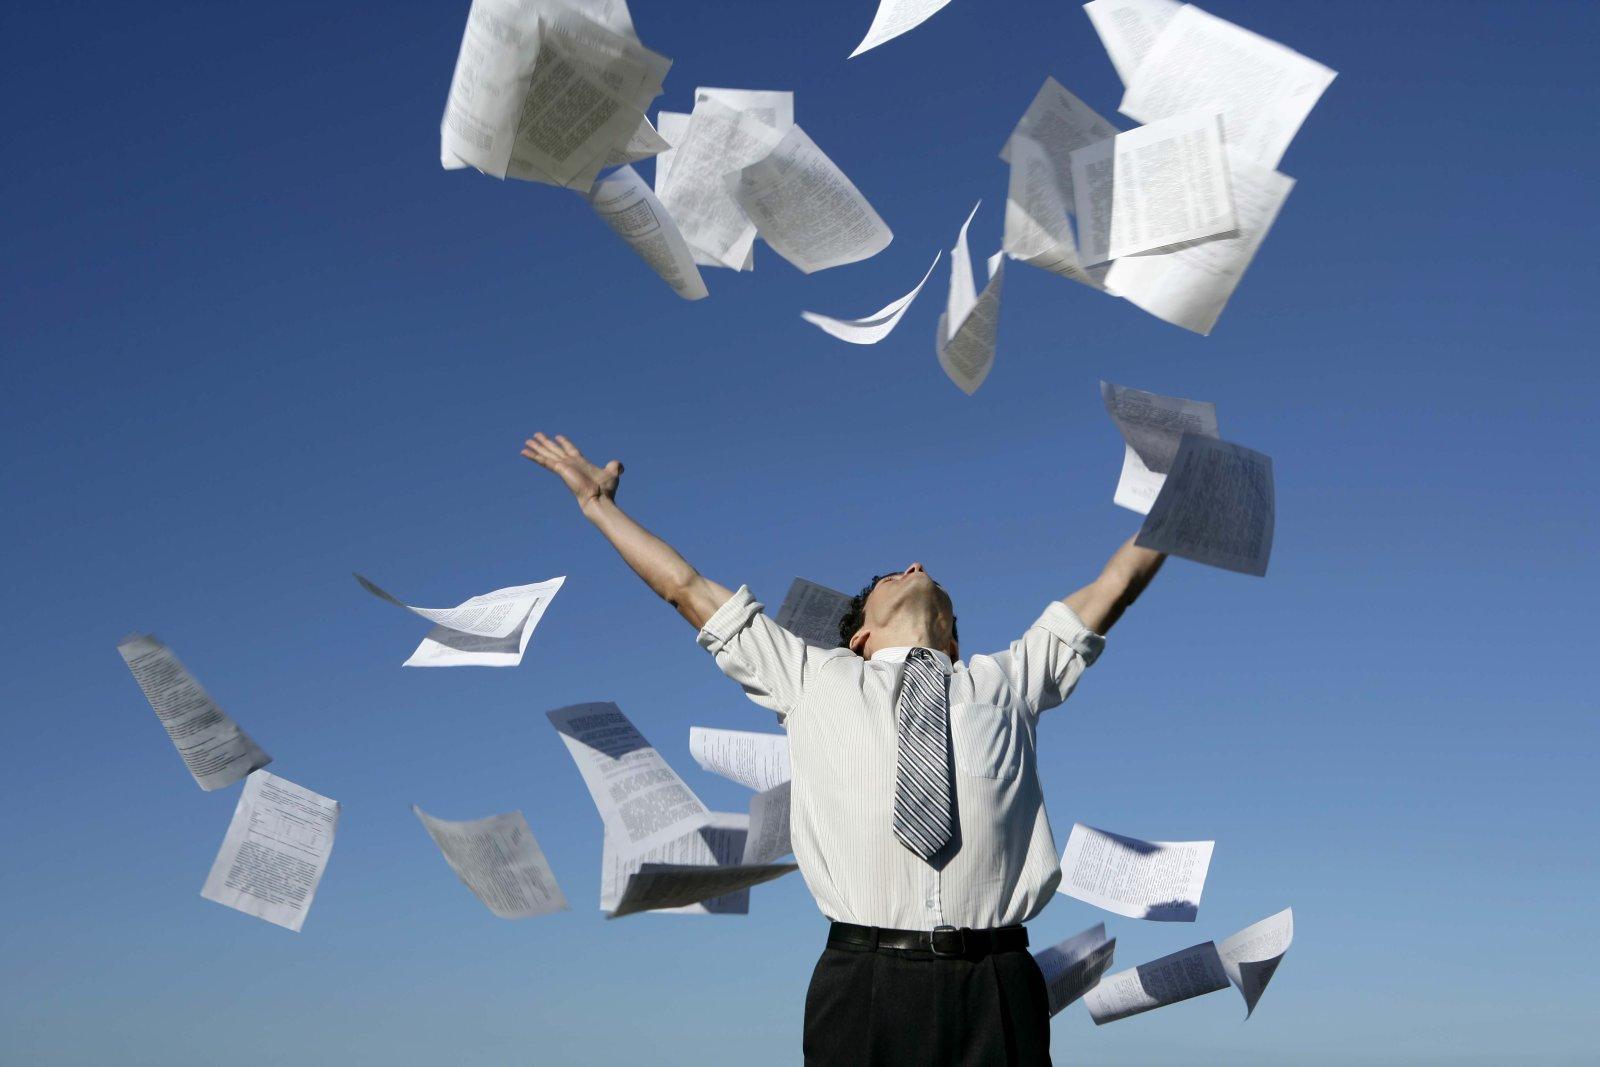 sample essays for admission